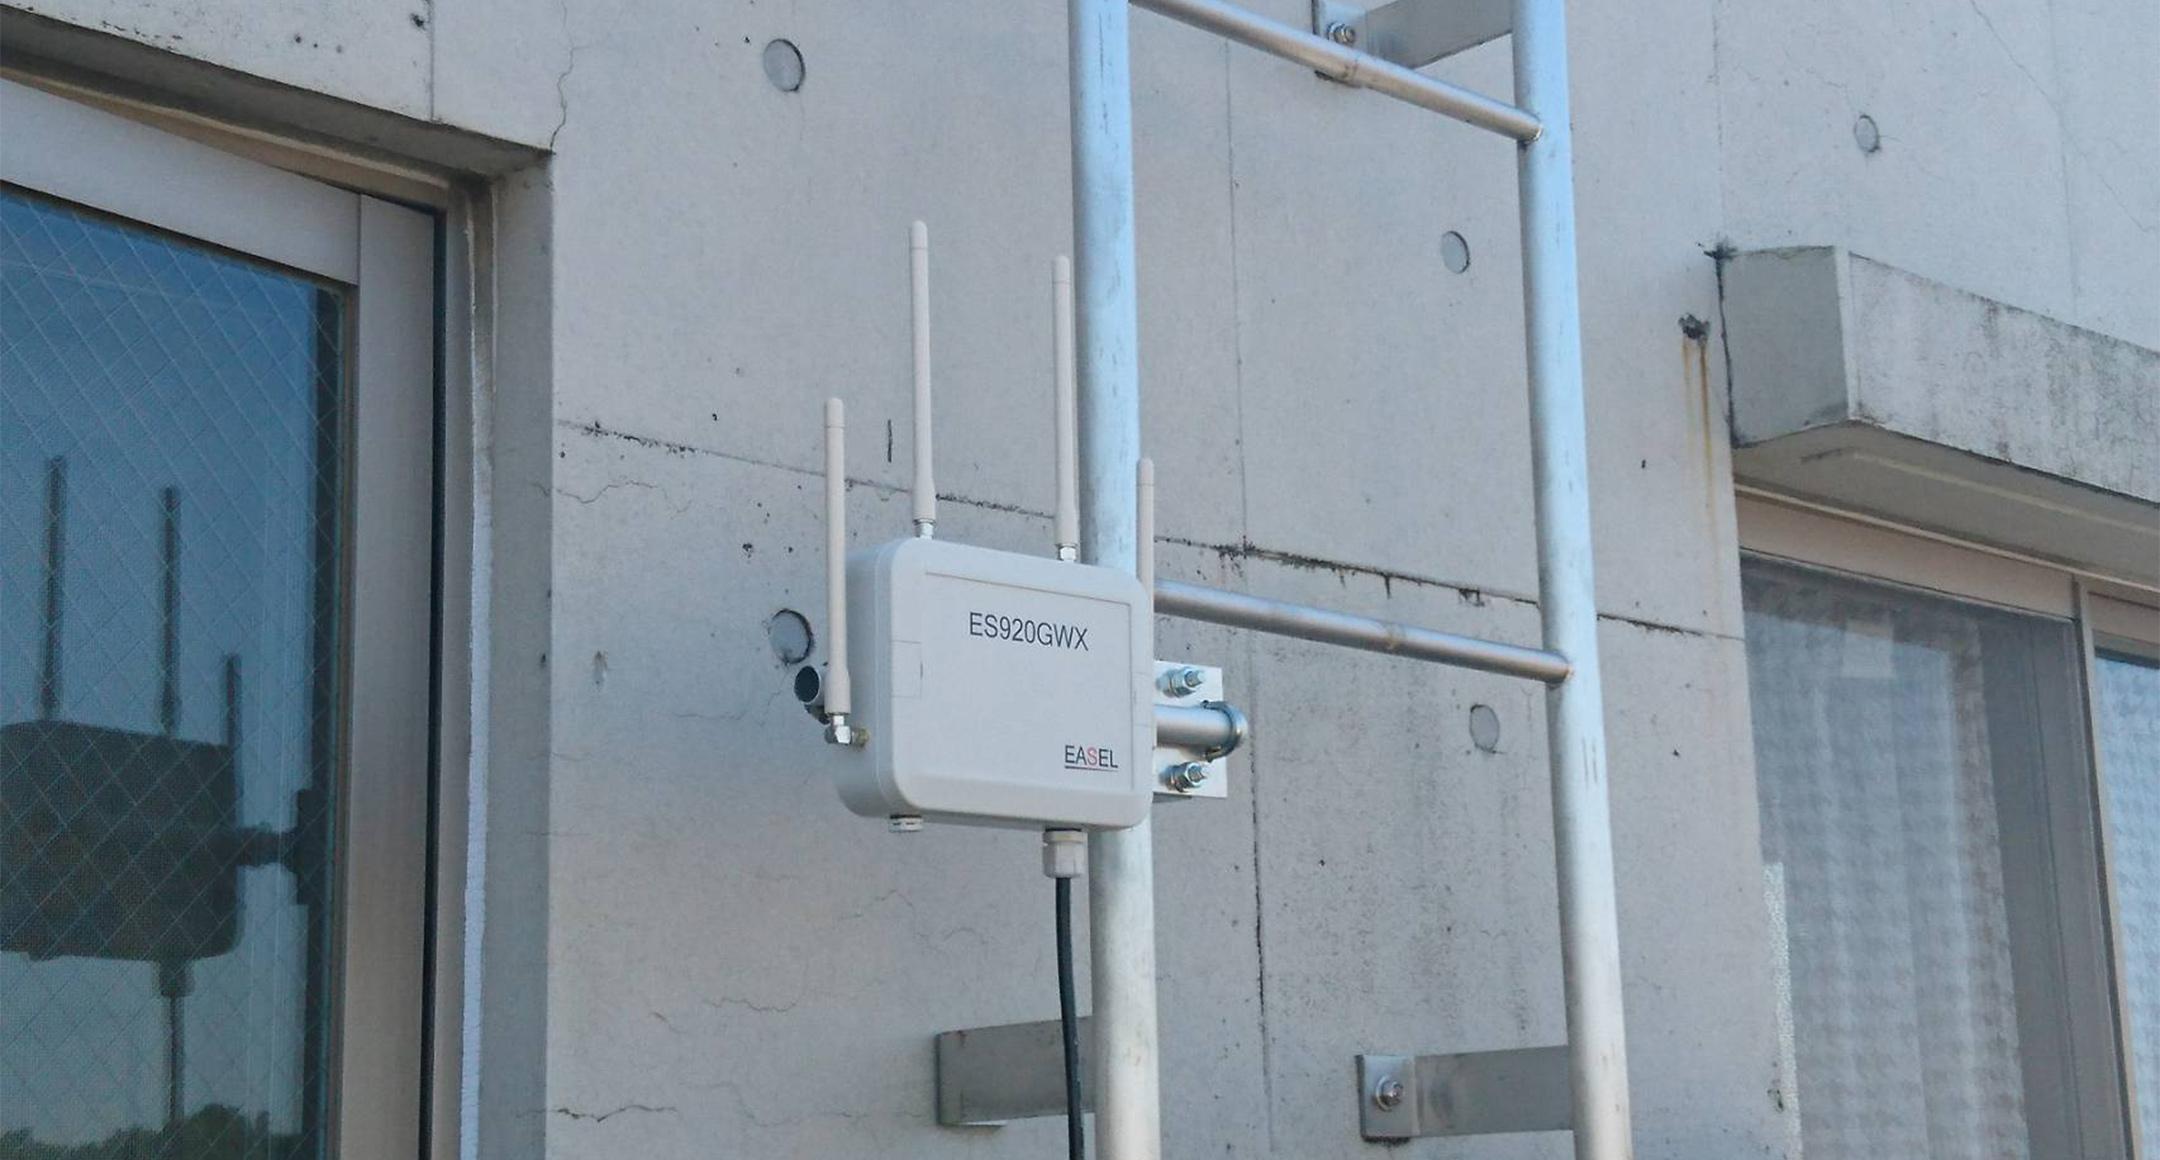 WEATHERPROOF CABLE GLAND - RMW series